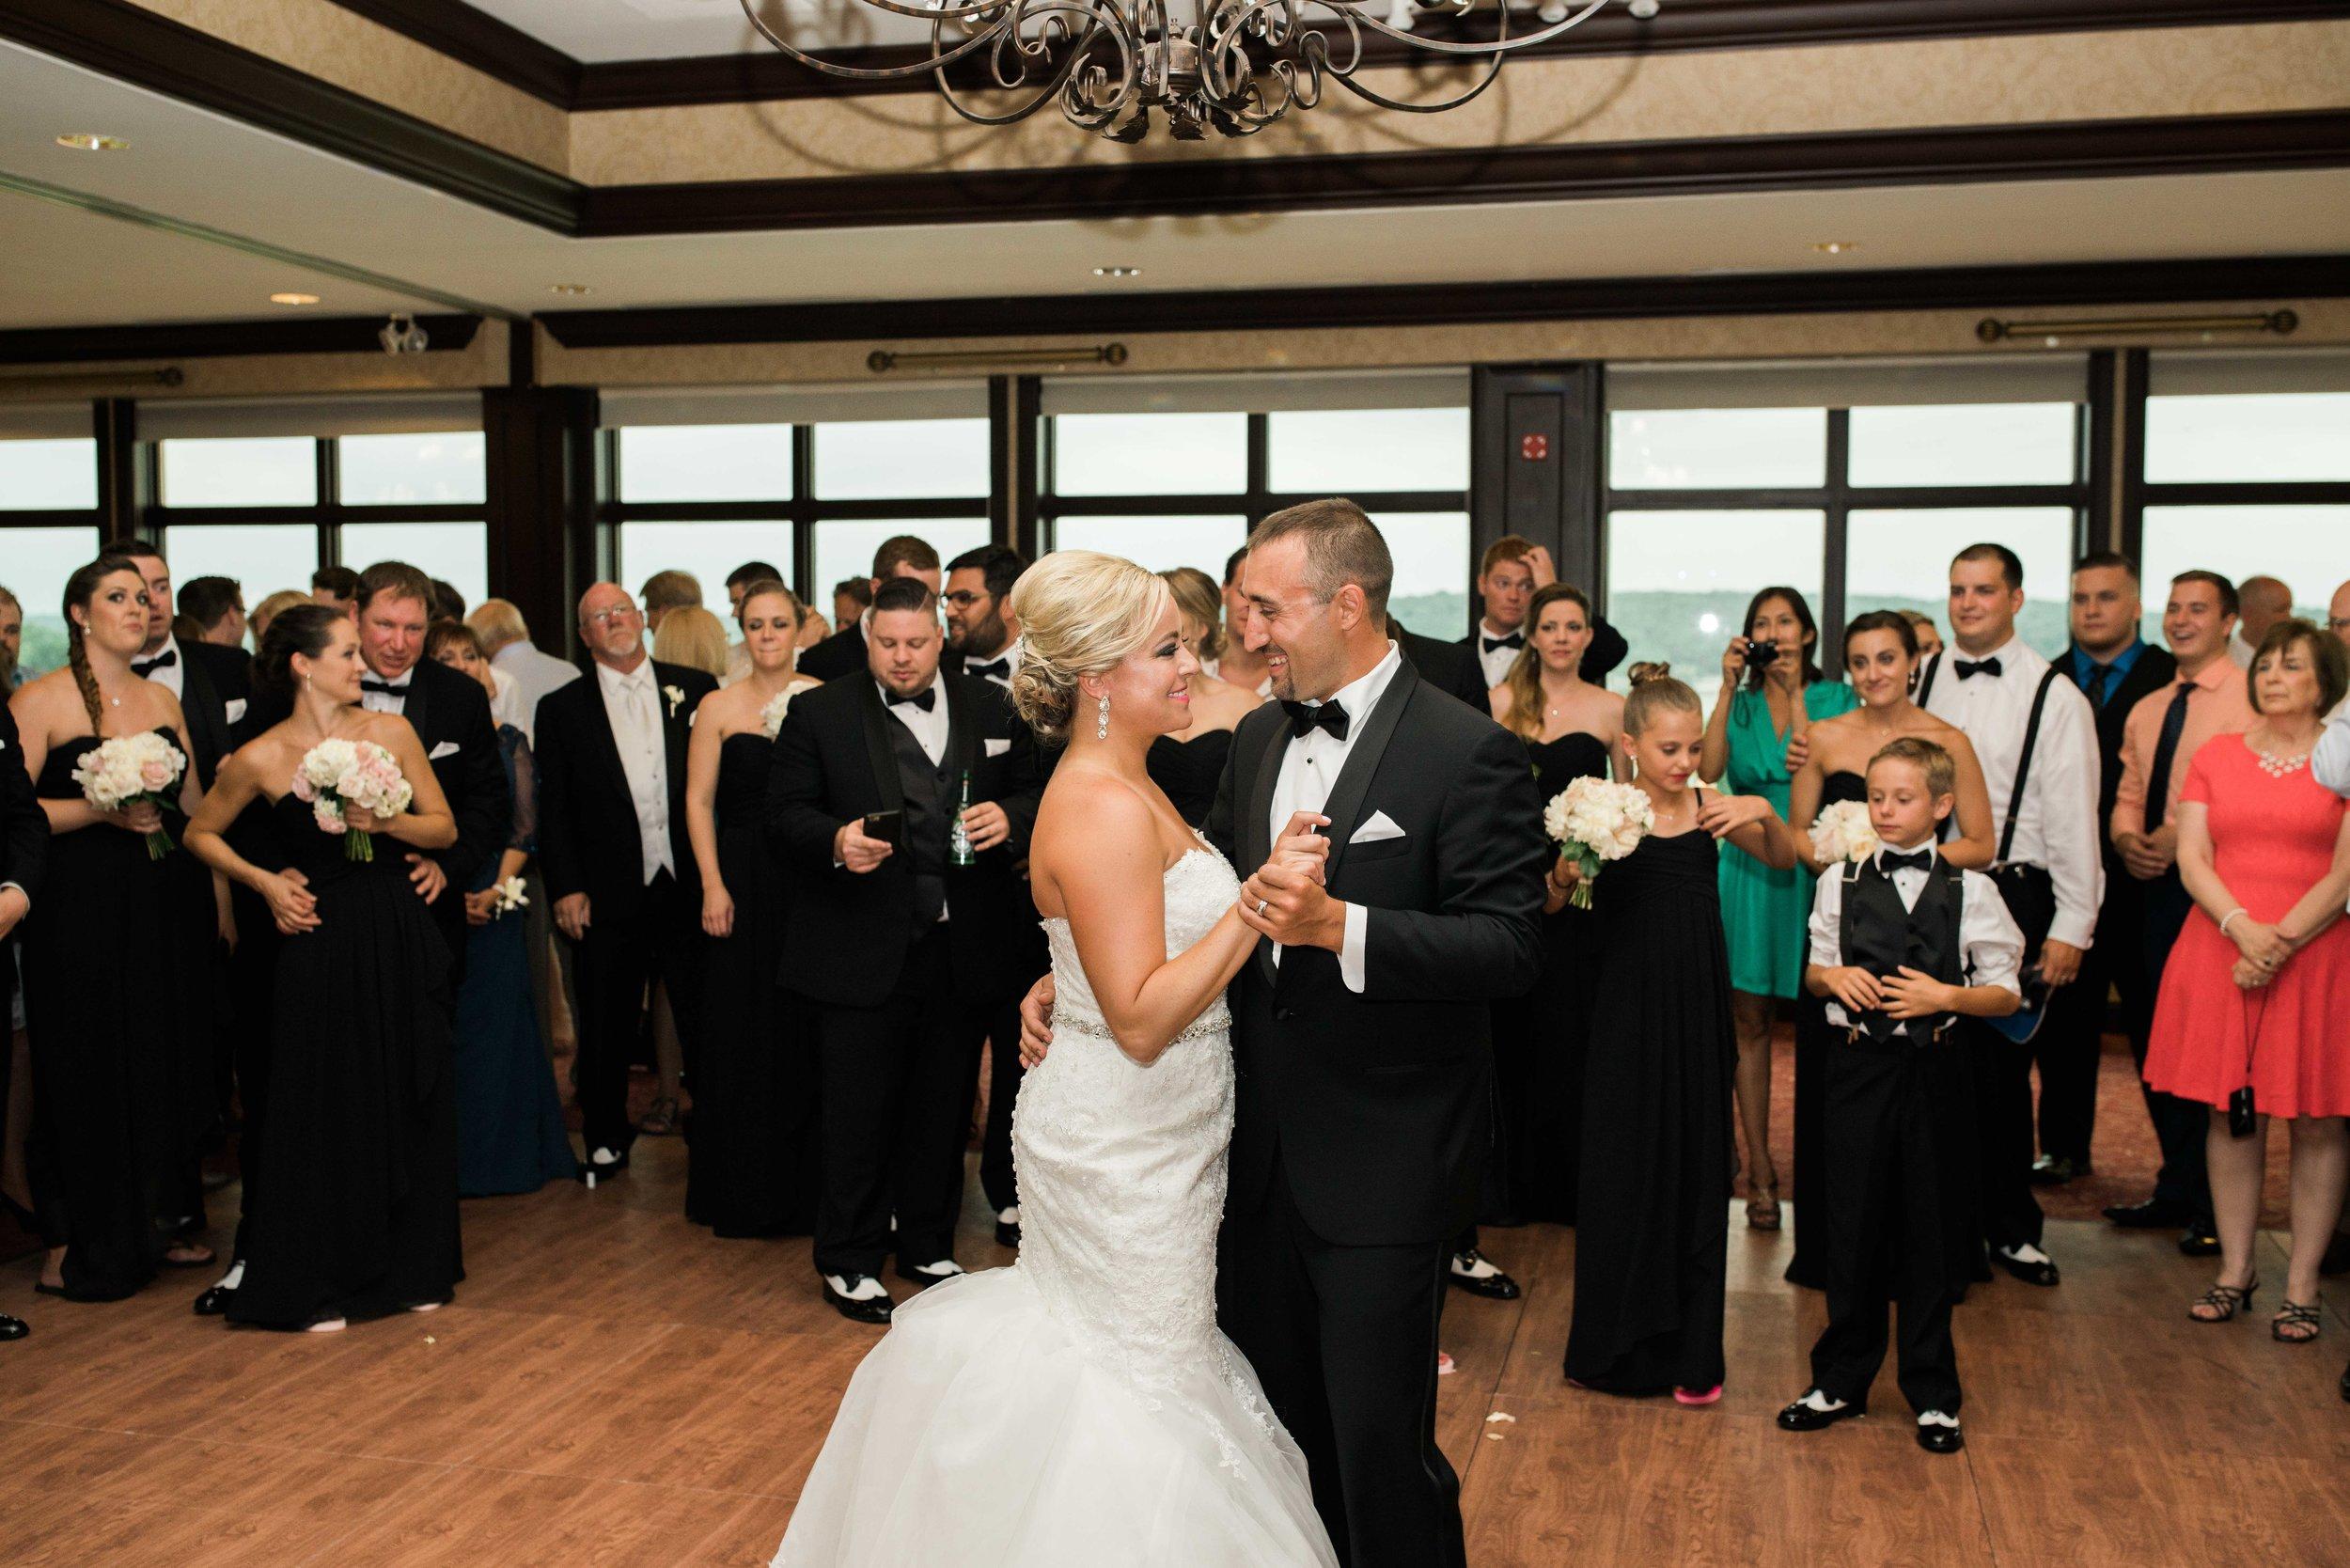 Lake Geneva Wedding Planner- Geneva National Wedding-Clover Events-Day-of Wedding Coordinator-Chicago Wedding Planner